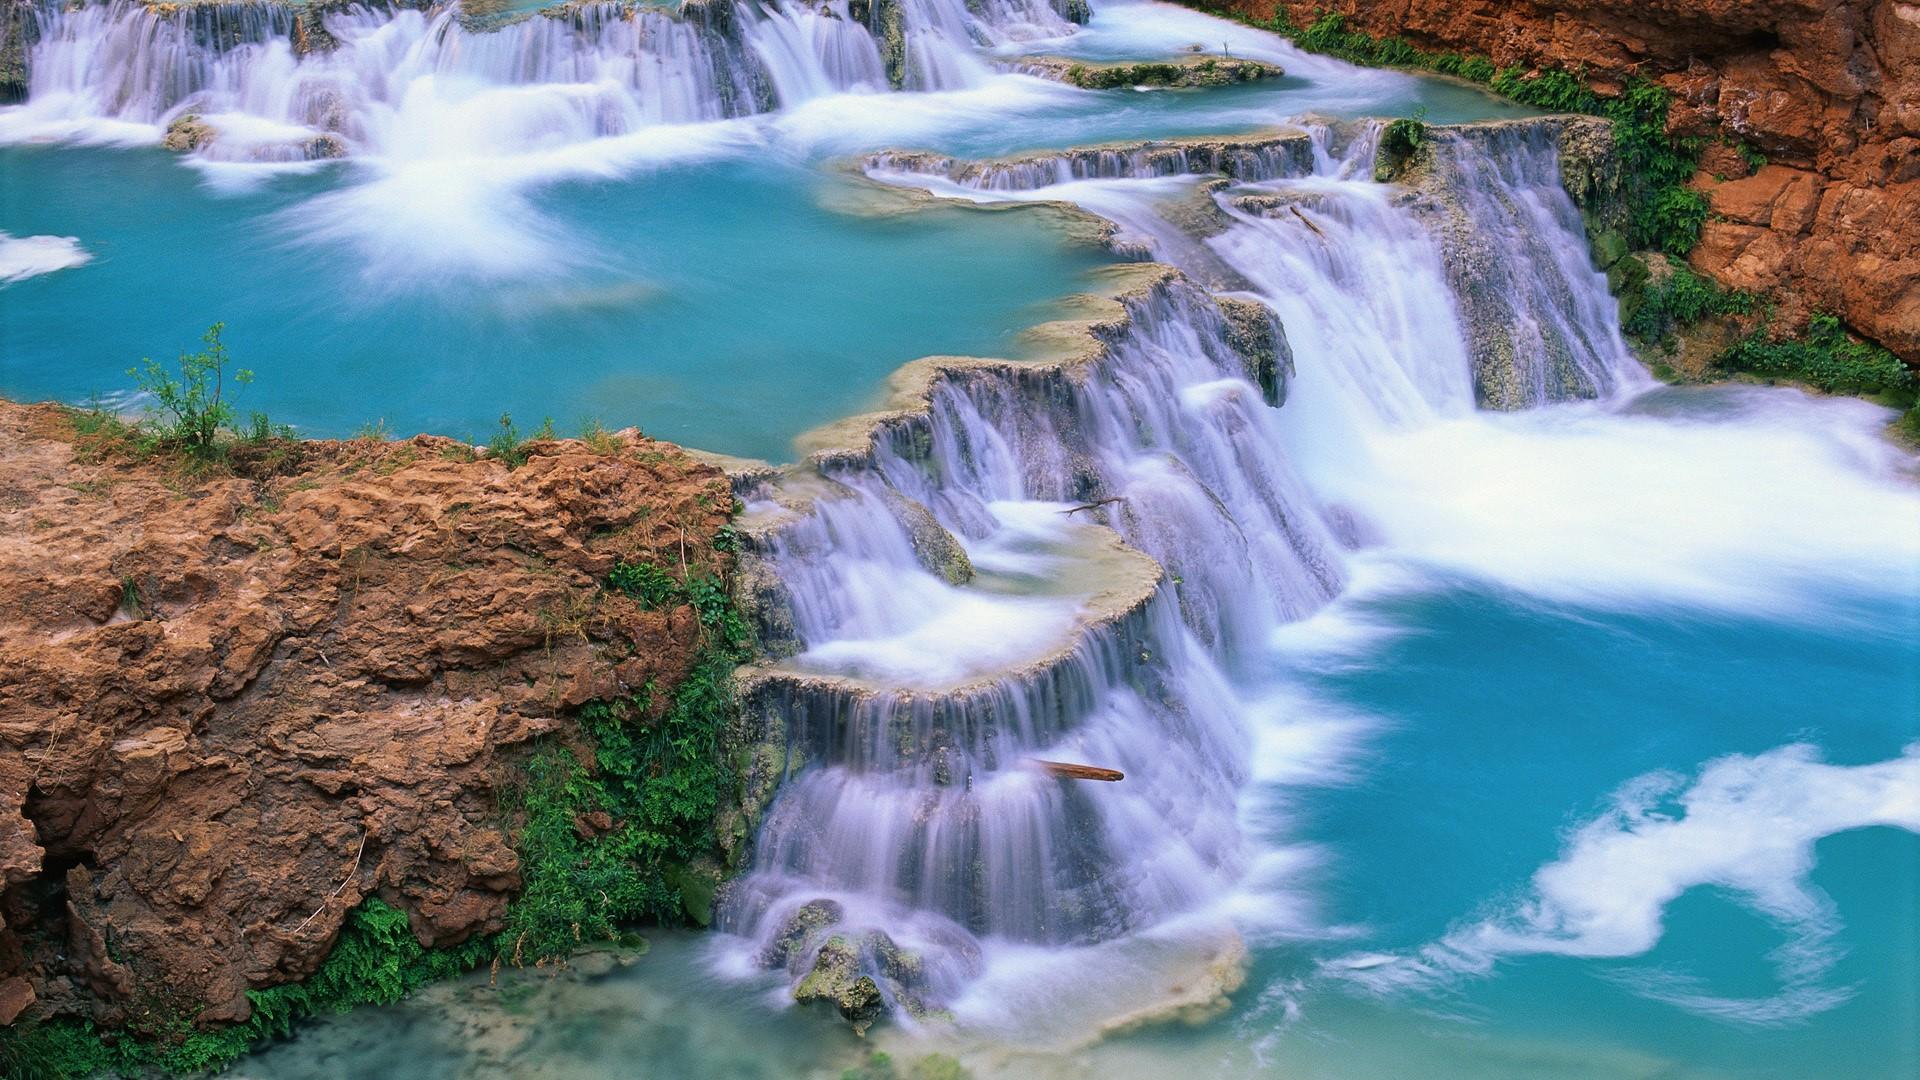 Waterfall wallpaper for laptop